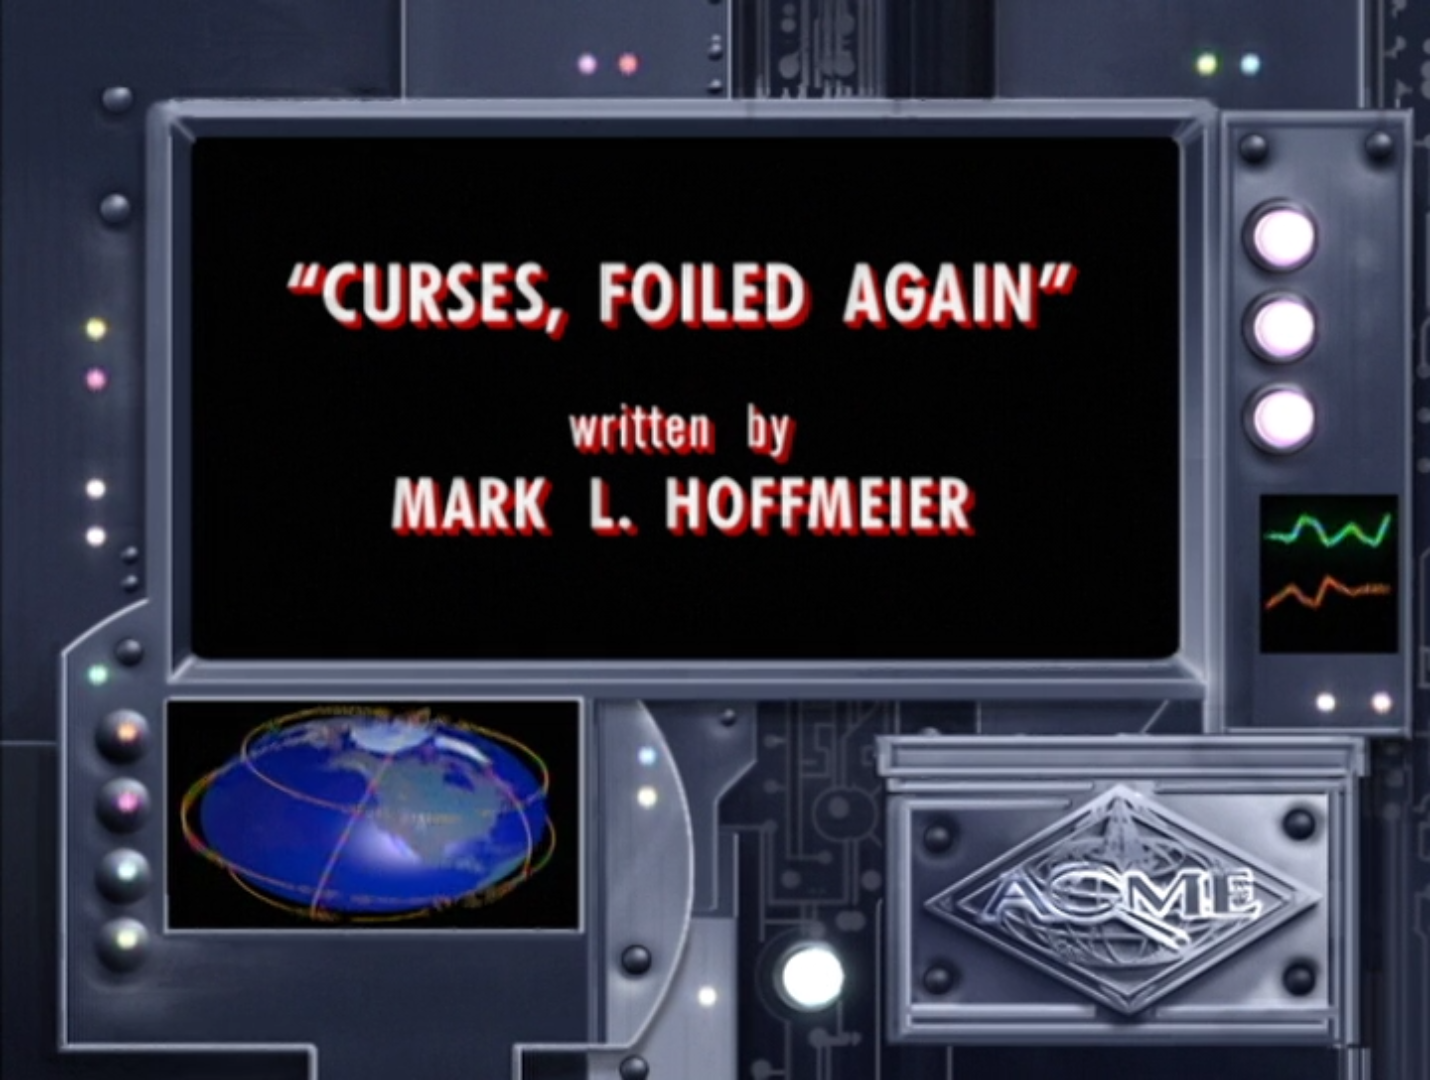 Curses, Foiled Again